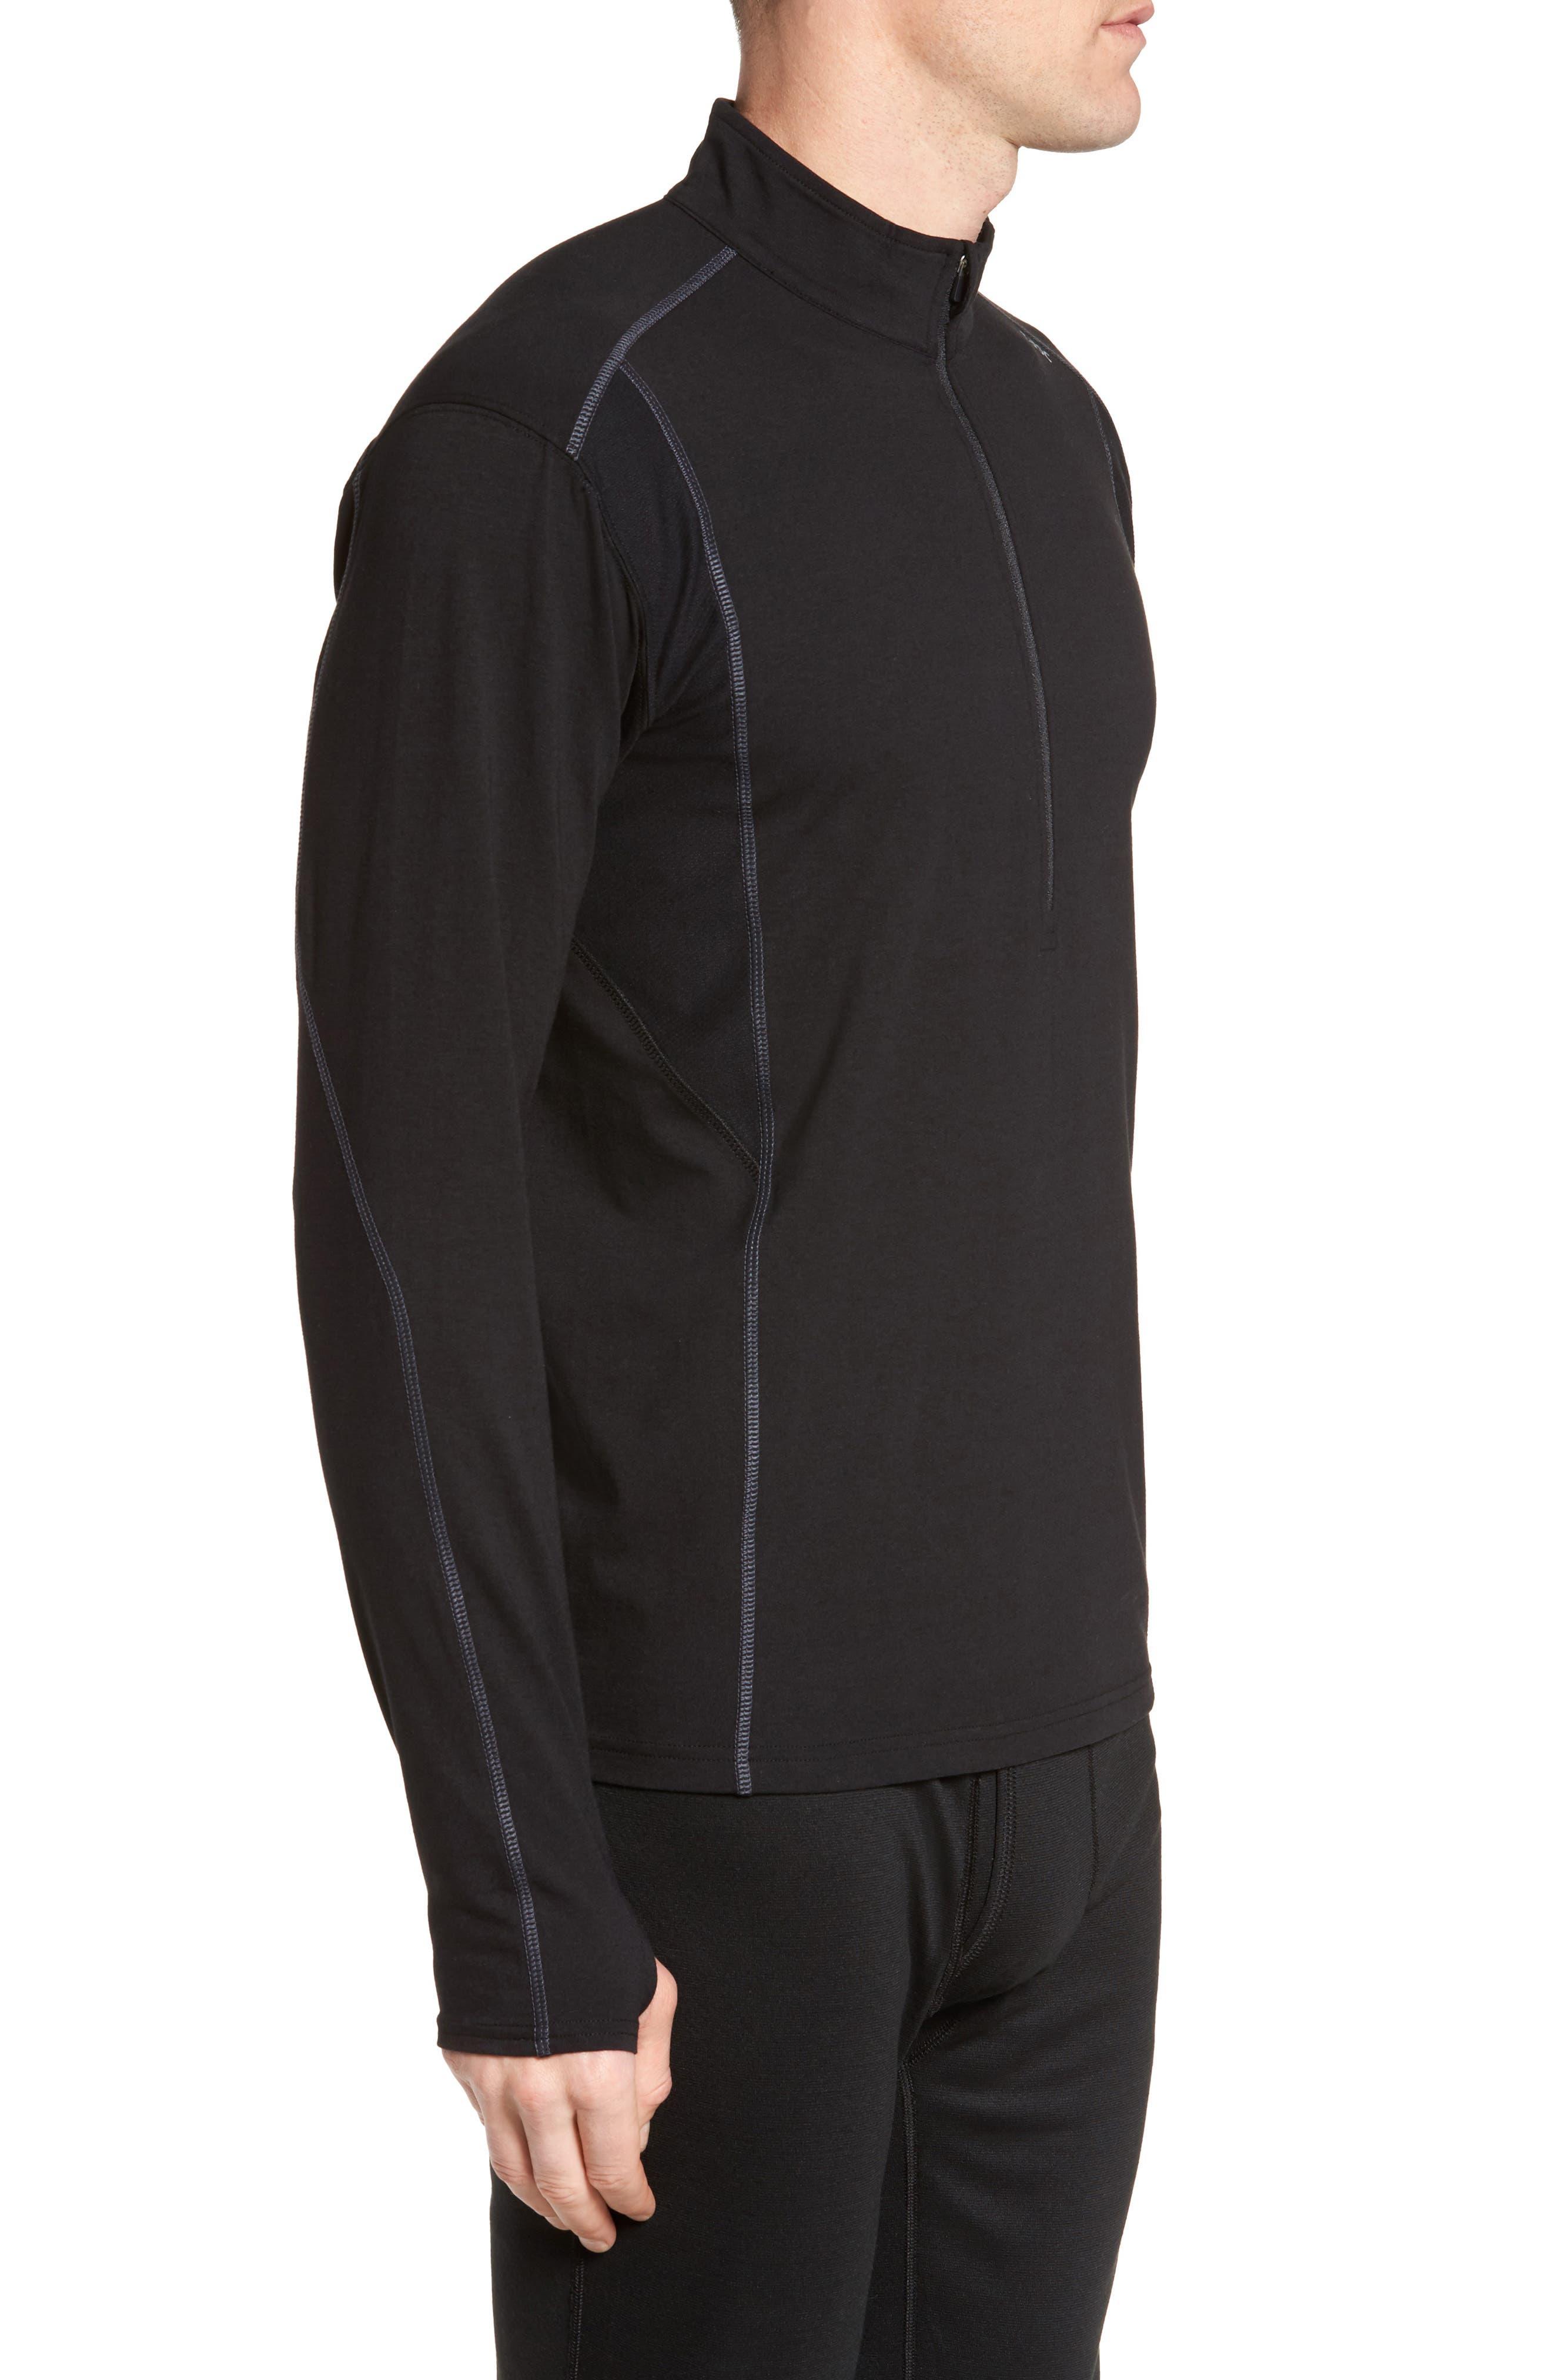 Charge Quarter-Zip Pullover,                             Alternate thumbnail 3, color,                             Black/ Gunmetal